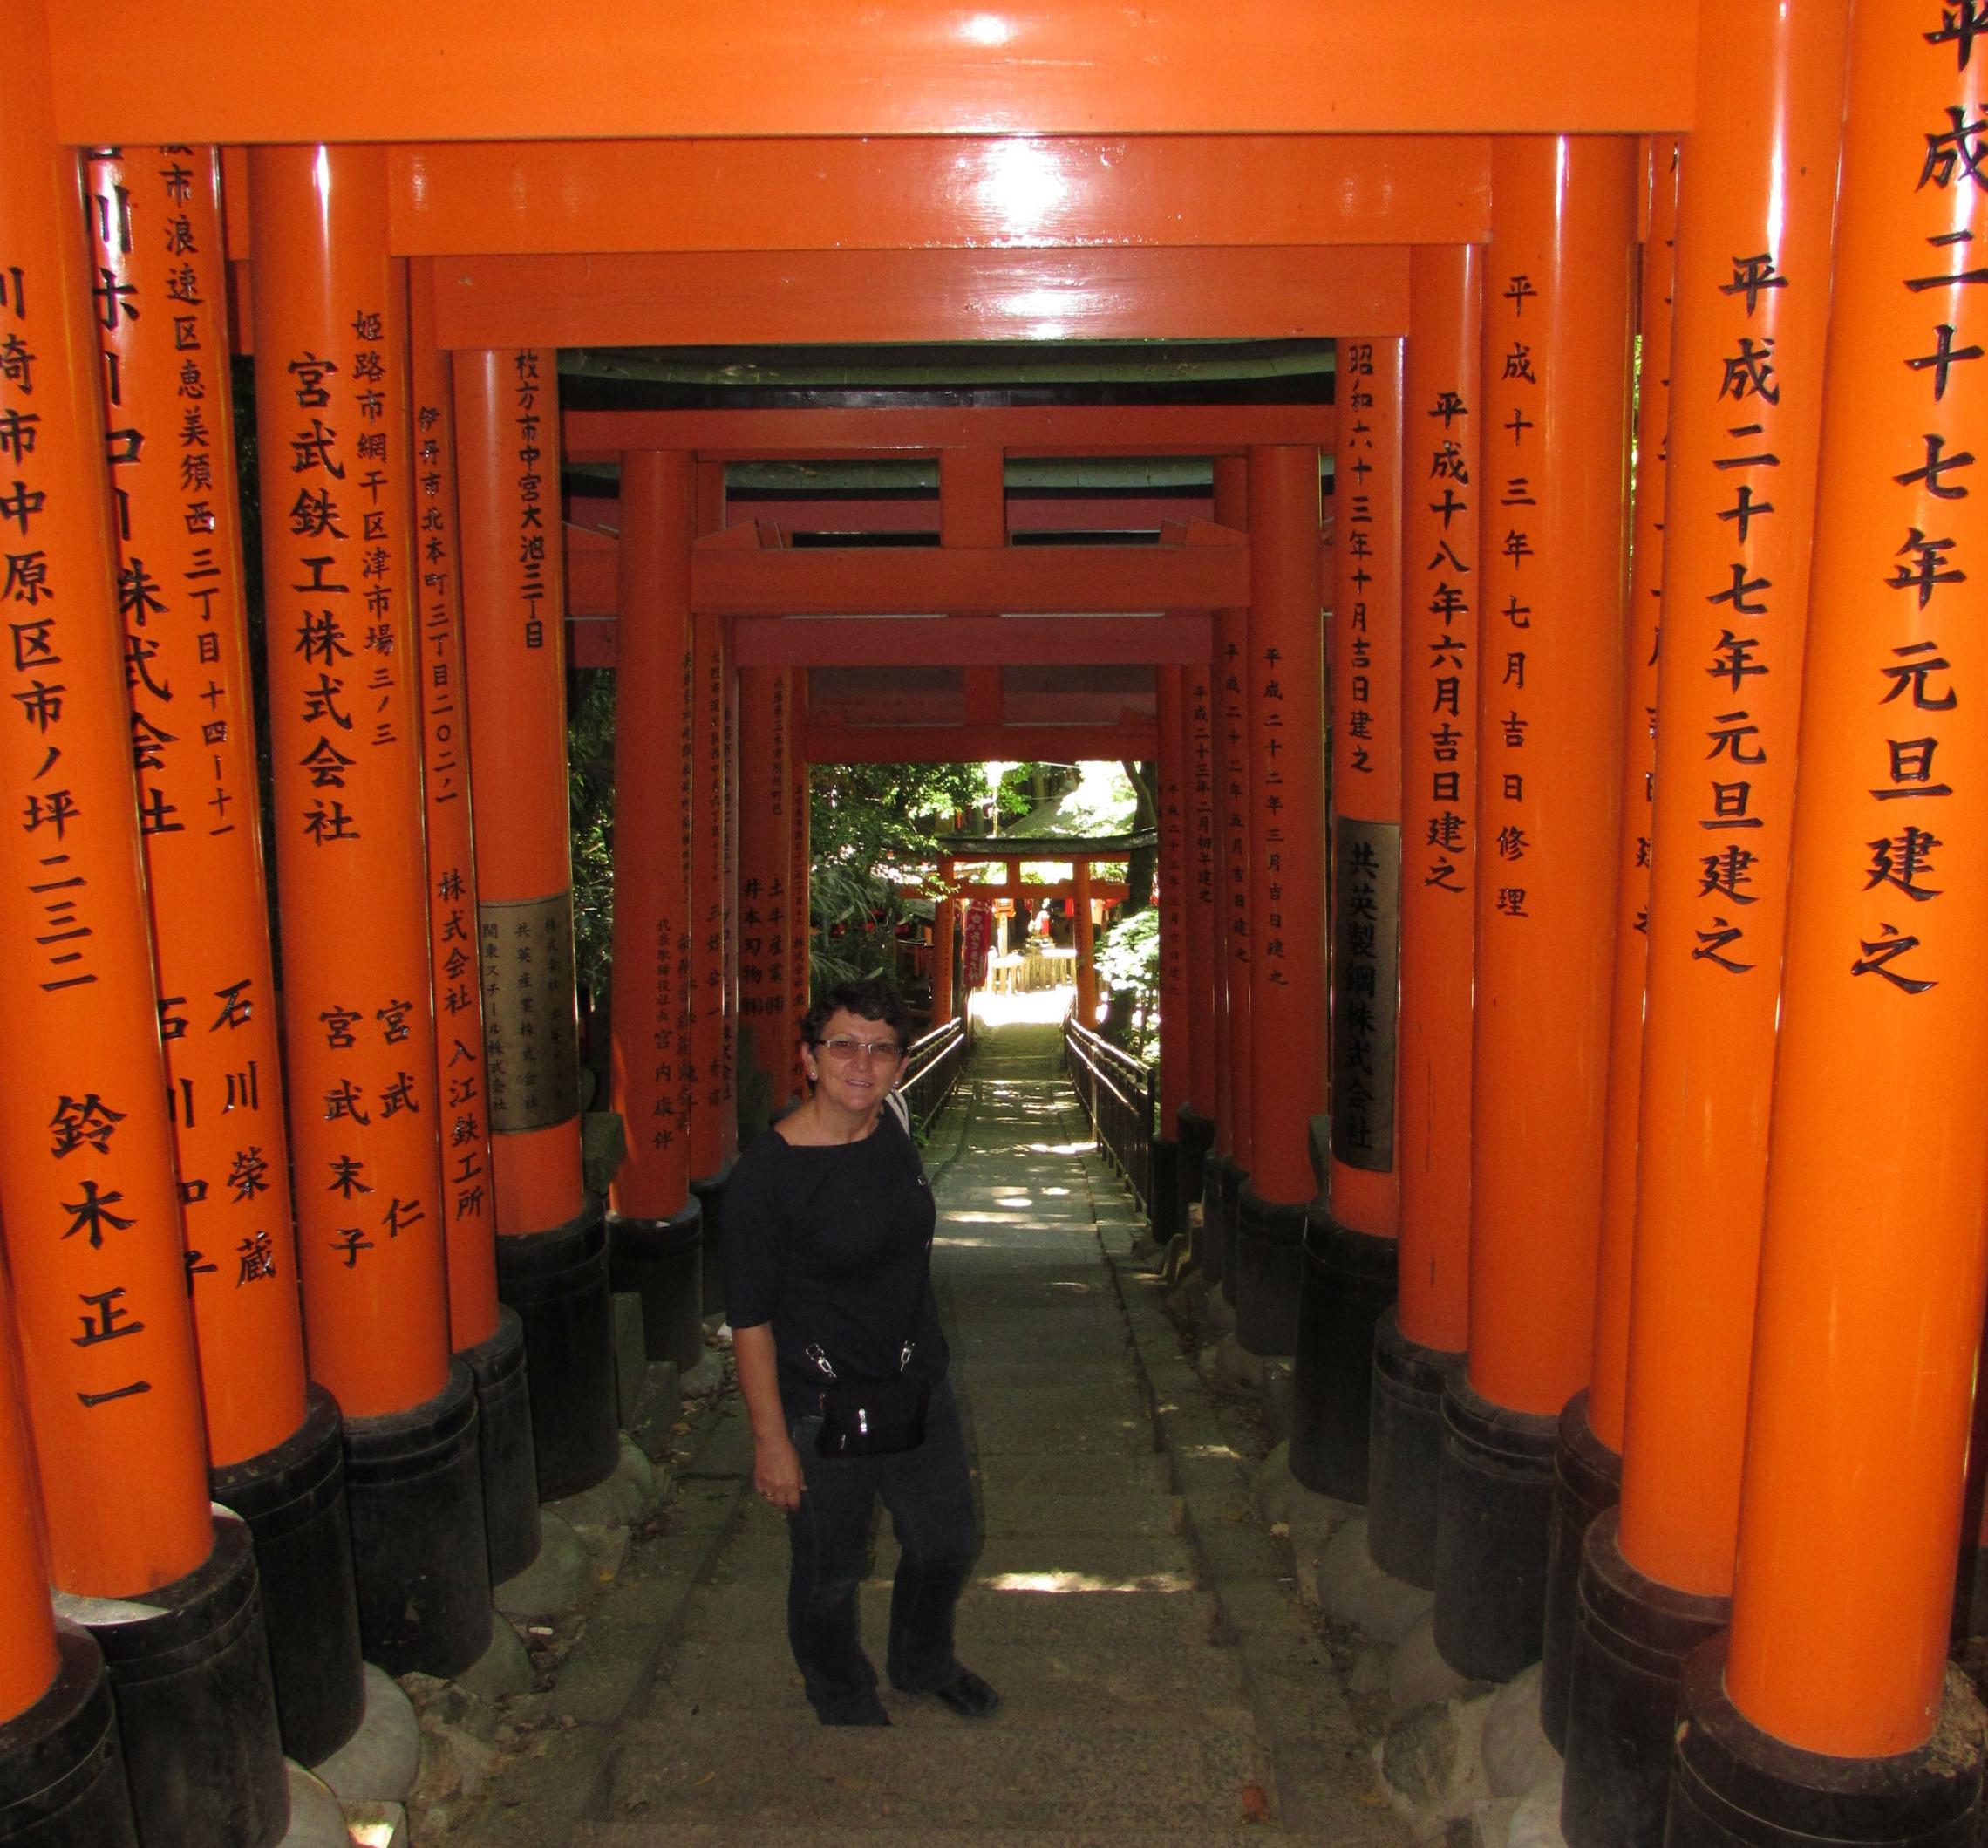 Walking underneath 1000 Torii's of the Fushimishi Inari shrine in Kyoto